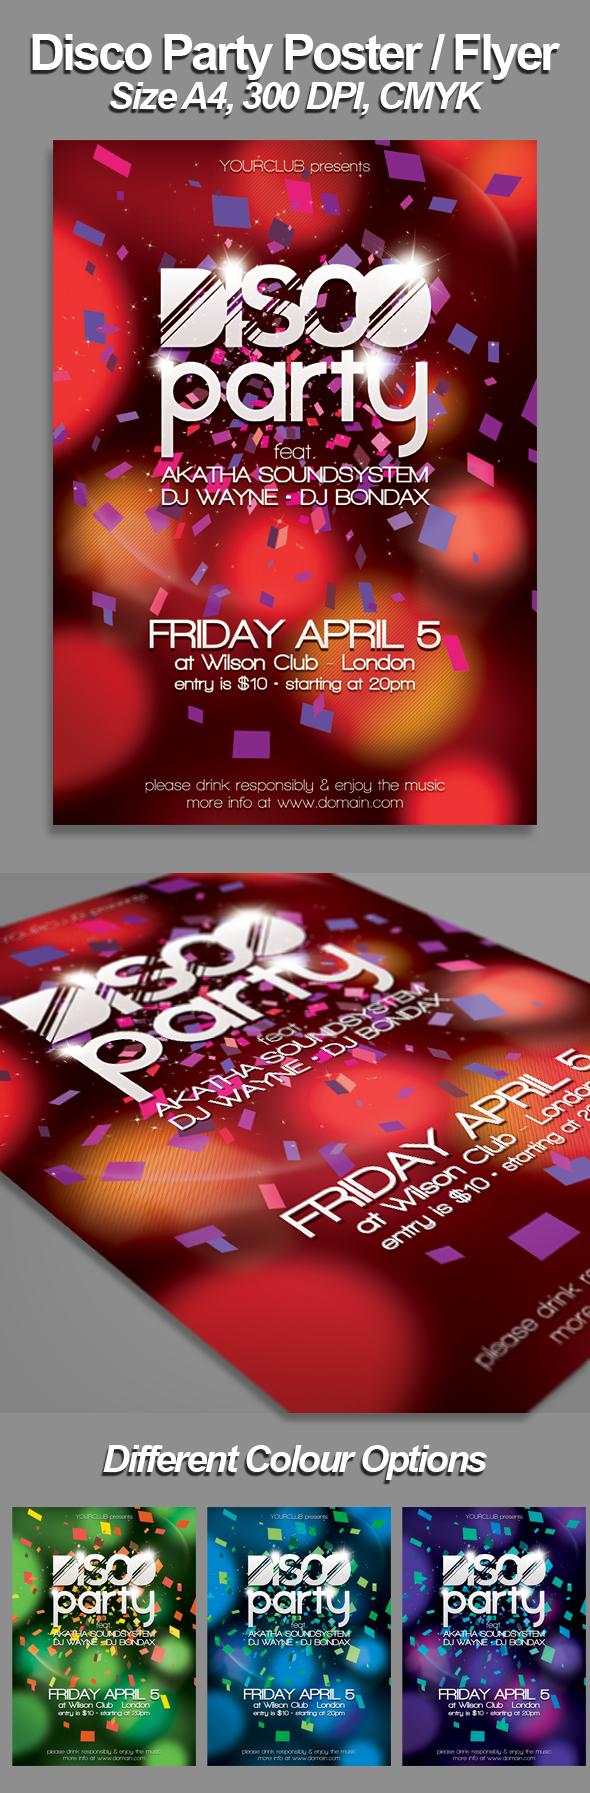 a4 disco flyer poster template psd on behance